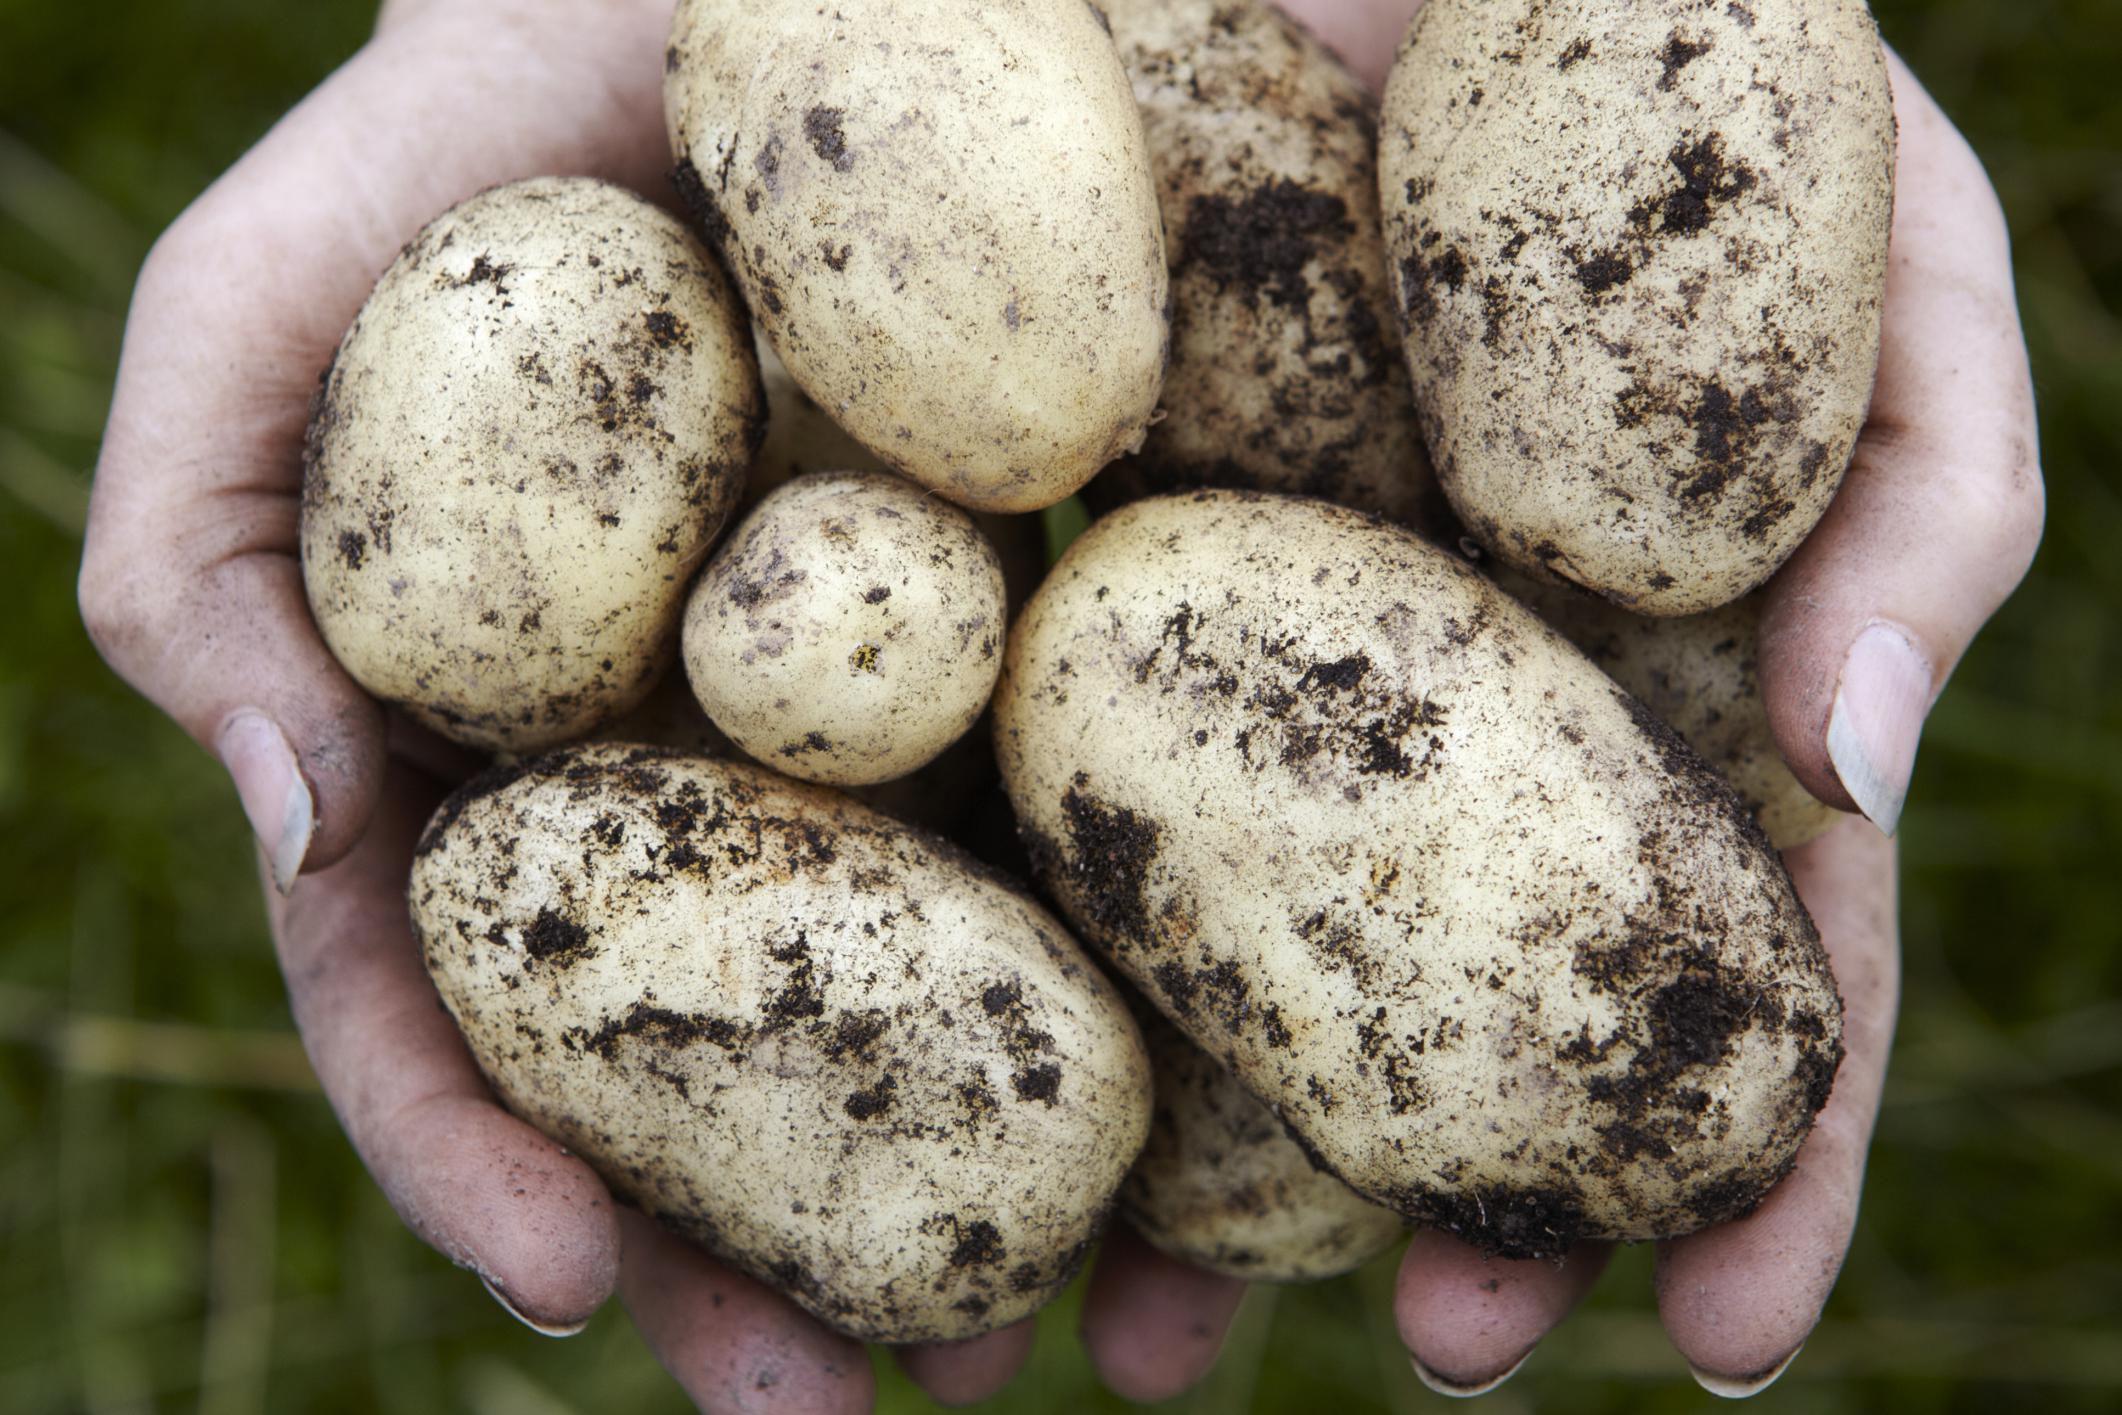 Growing Potatoes in the Home Garden